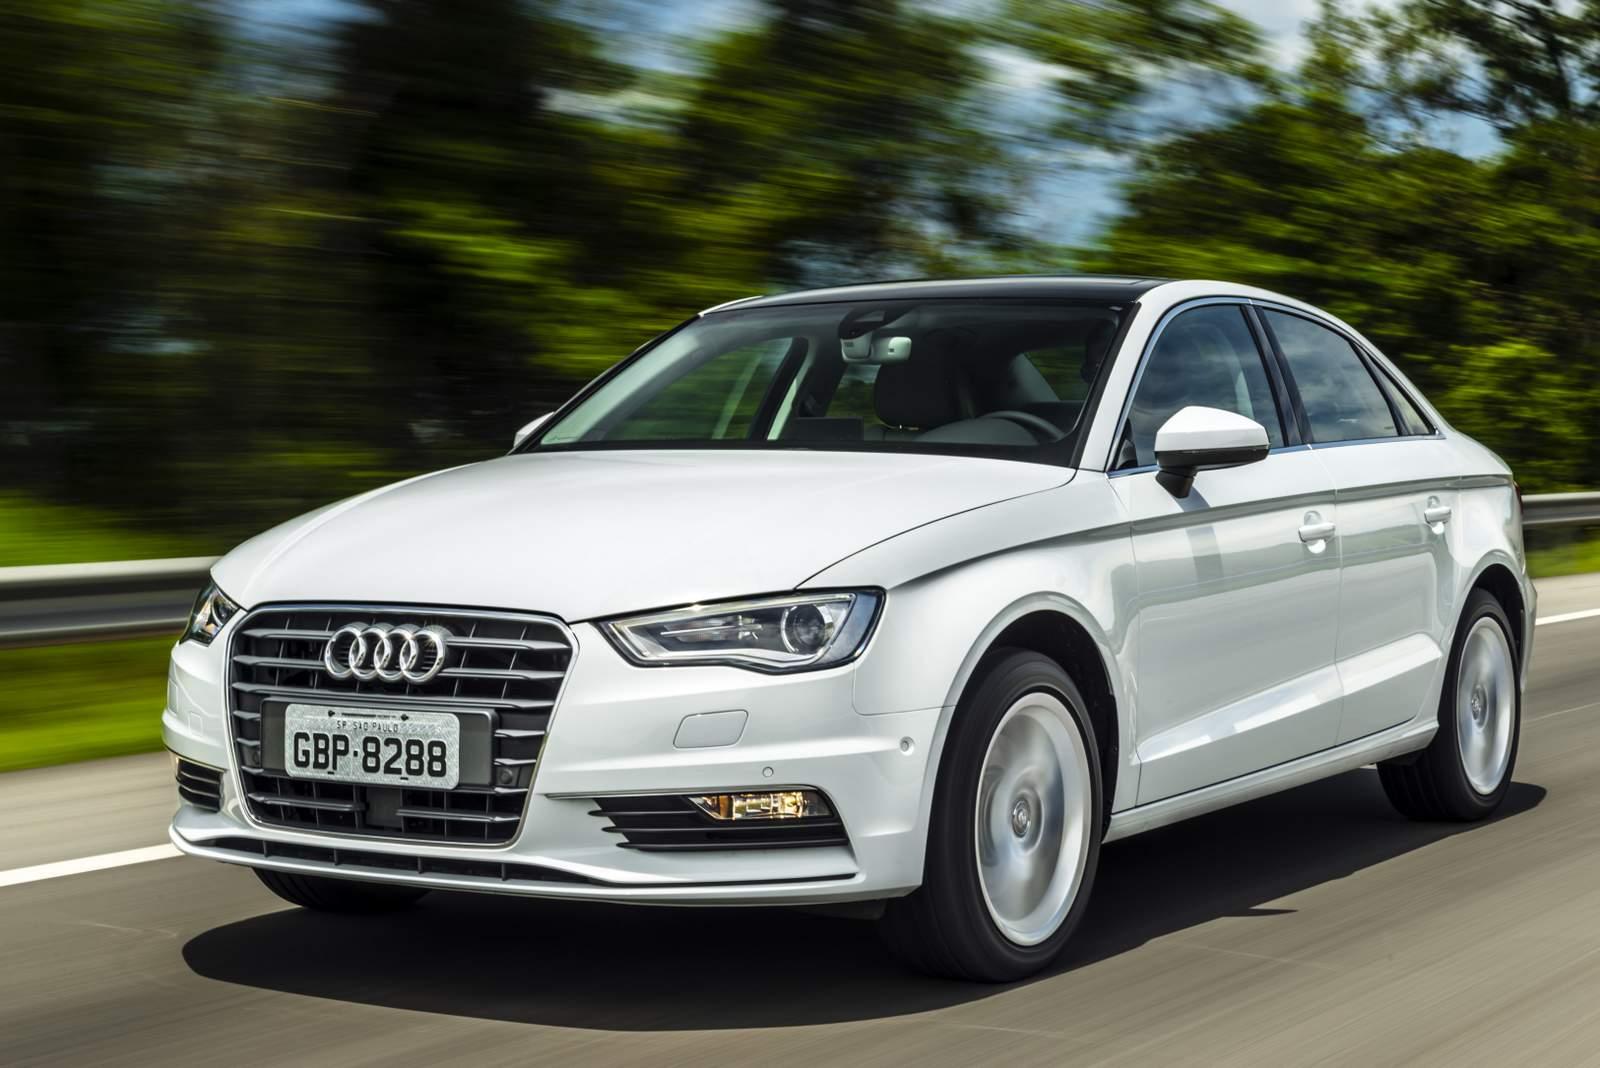 Novo Audi A3 Sedan 2.0 Ambititon 2016